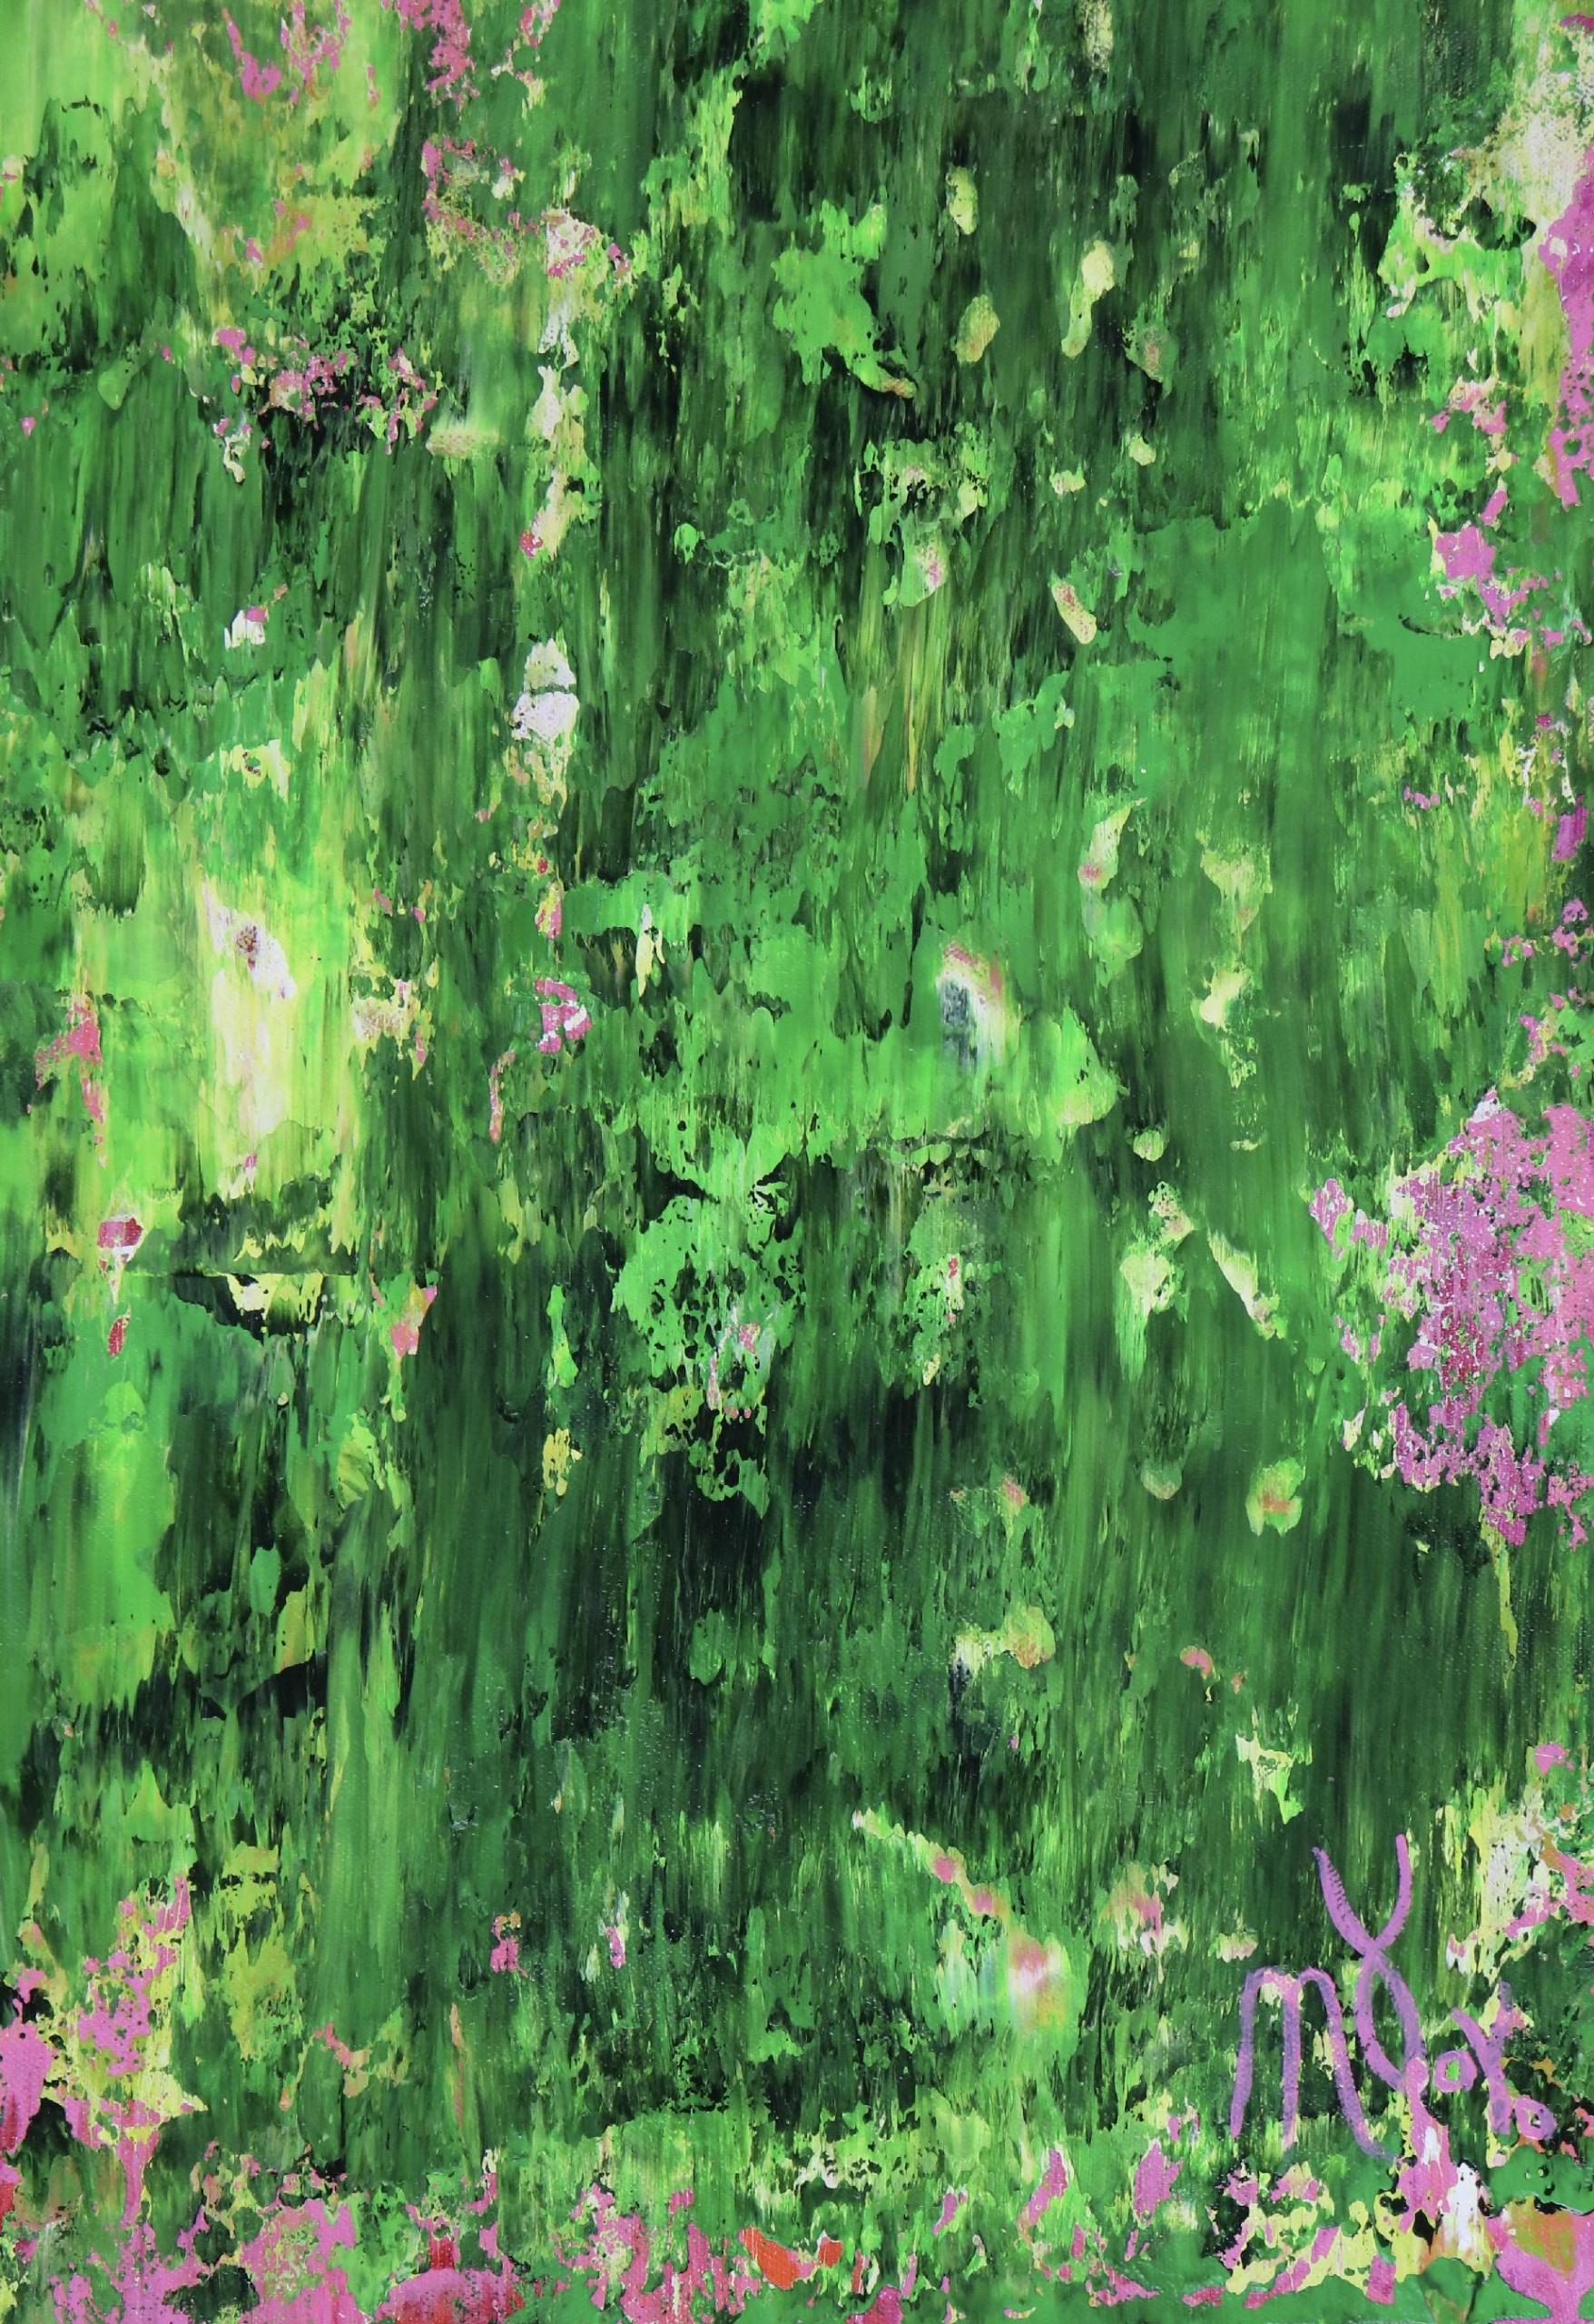 DETAIL - Verdor (A Romance With Green) 3 by Nestor Toro